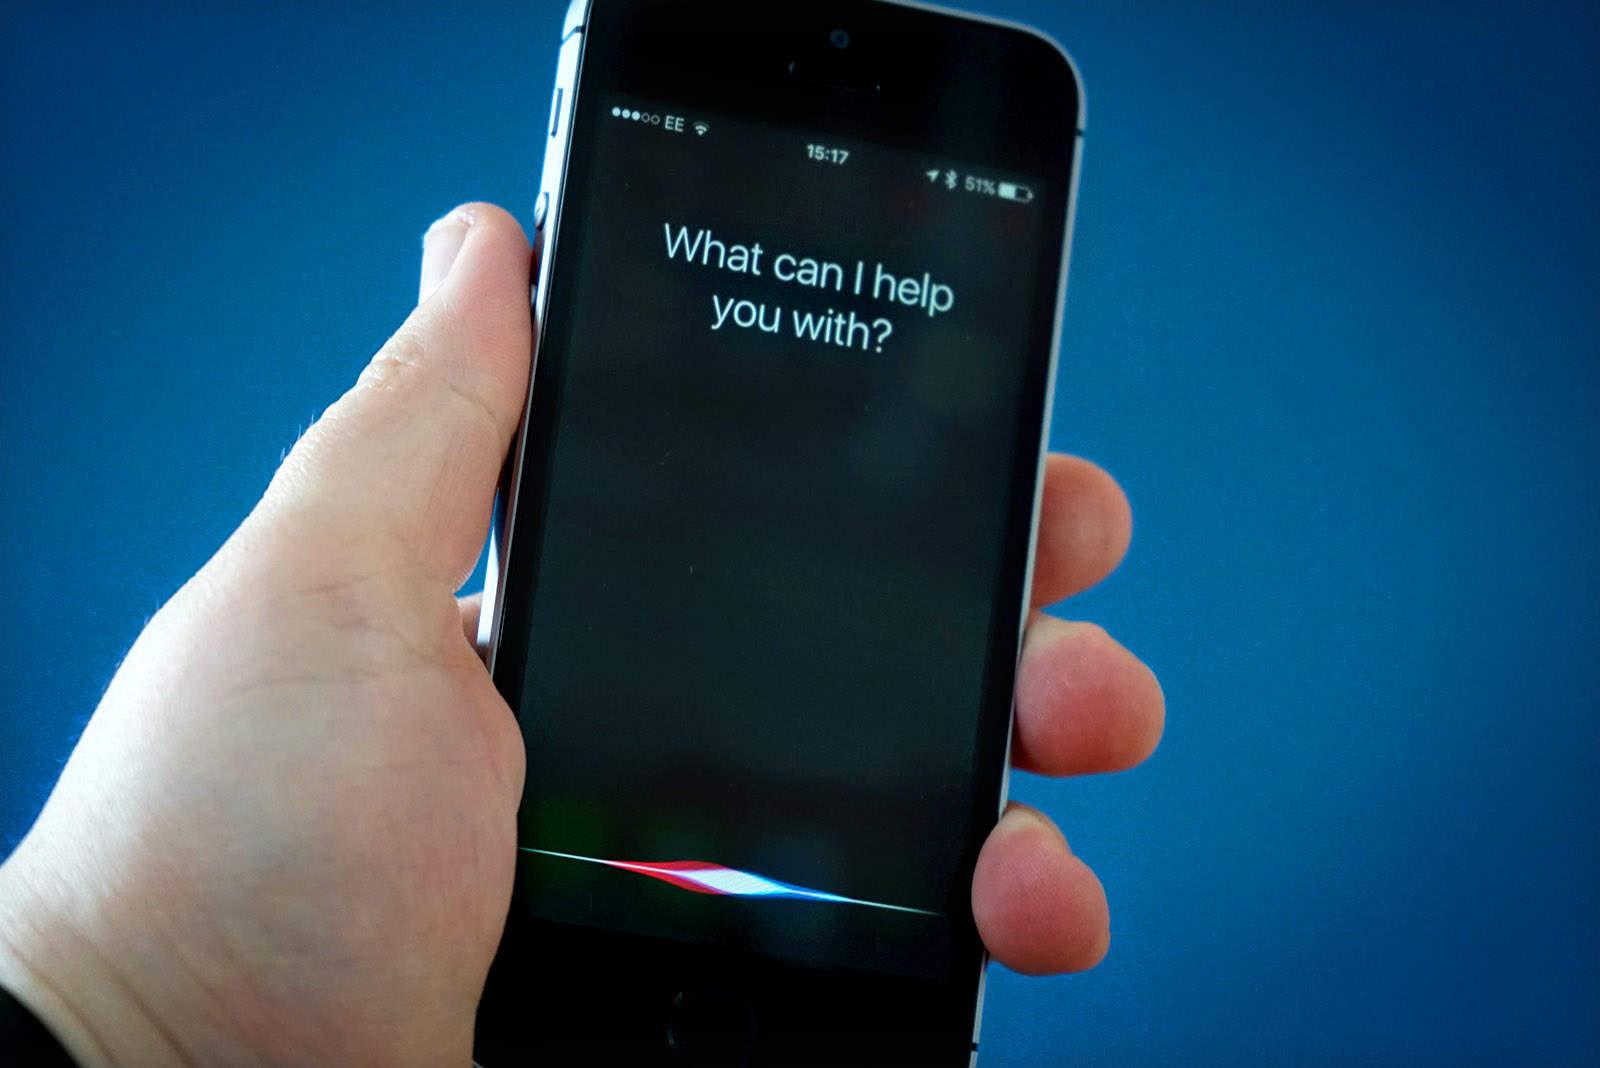 How to hack phones with voice commands hidden in YouTube videos